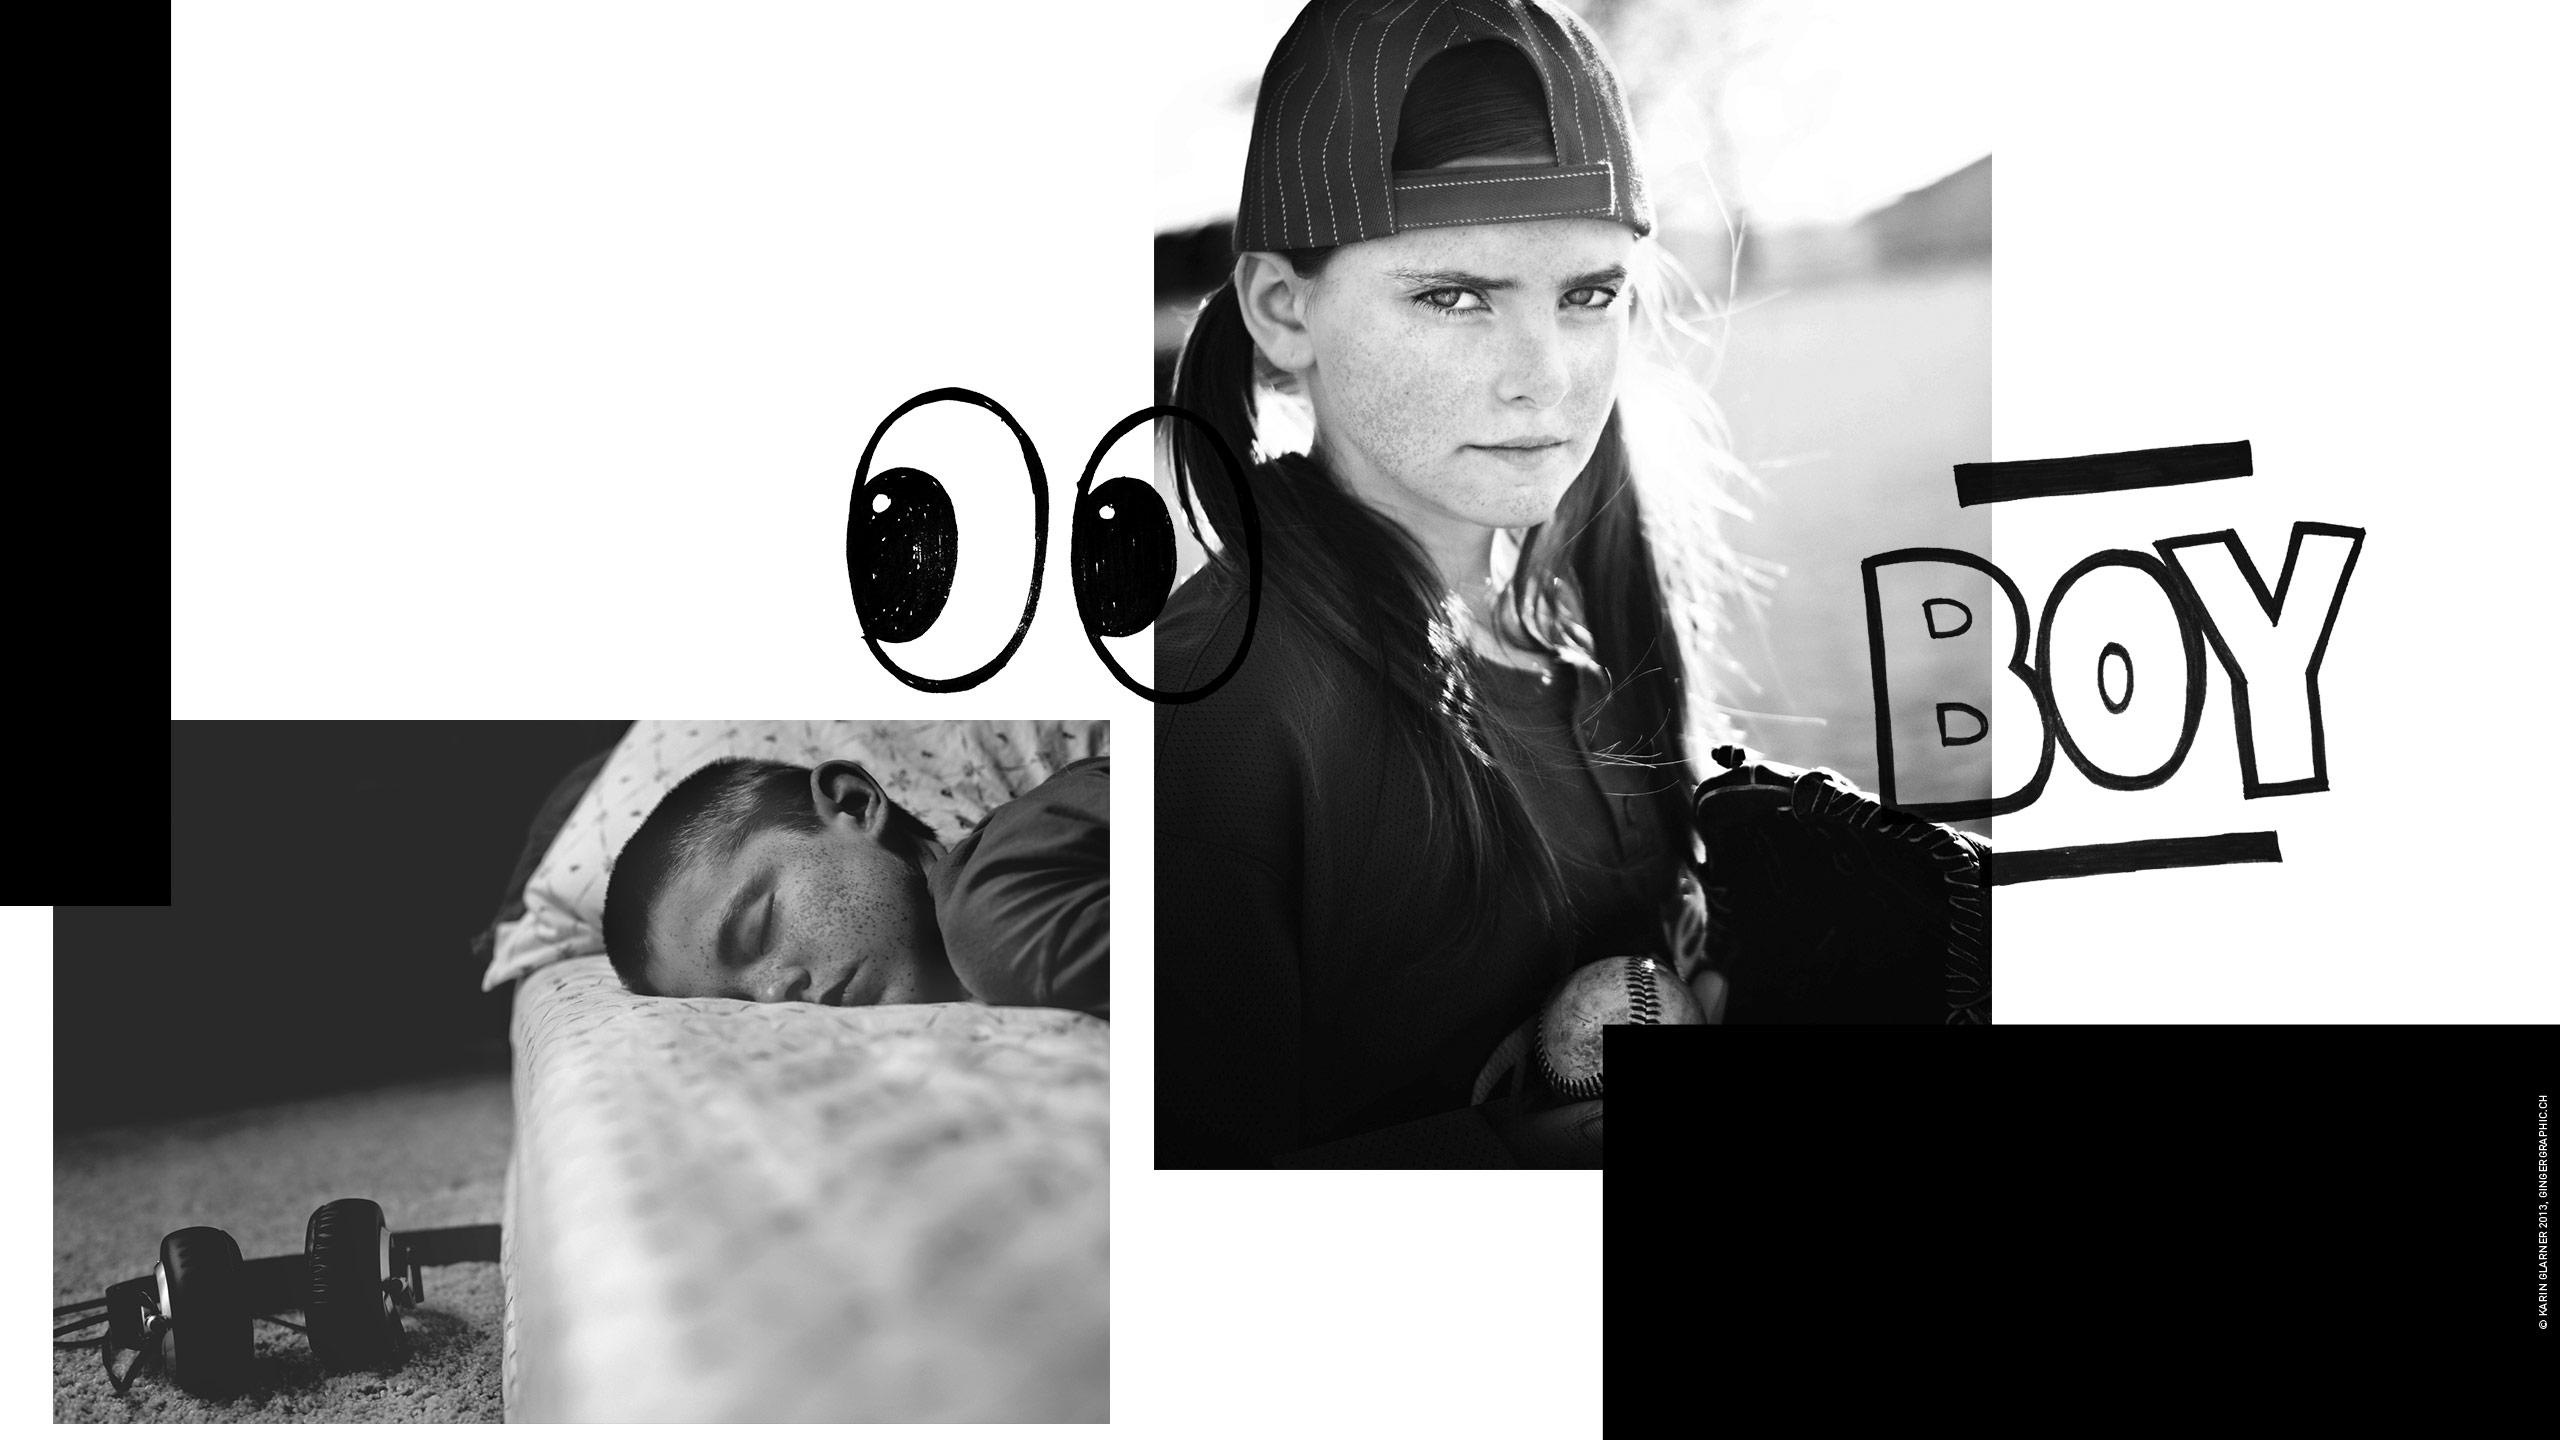 8_editorial_copyrightgingergraphic_ch_kglarner